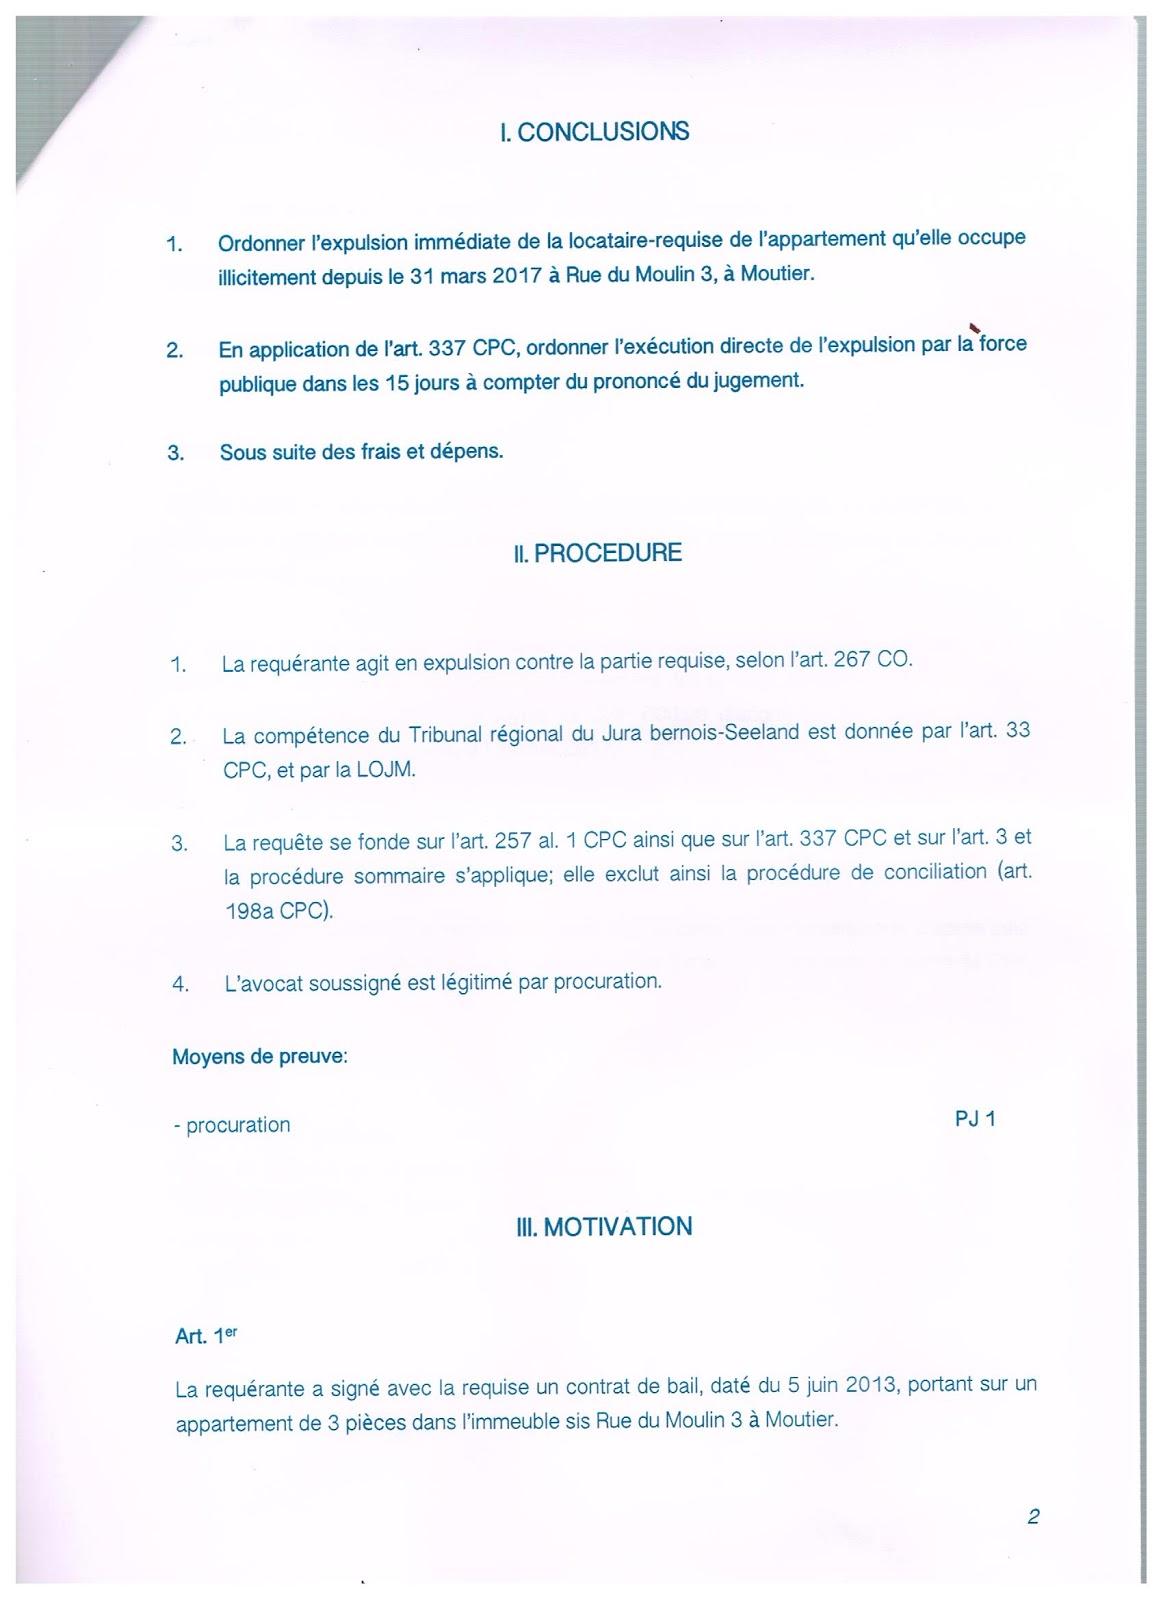 Resume Cover Letter Receptionist Cv Letter And Cover Letter Resume